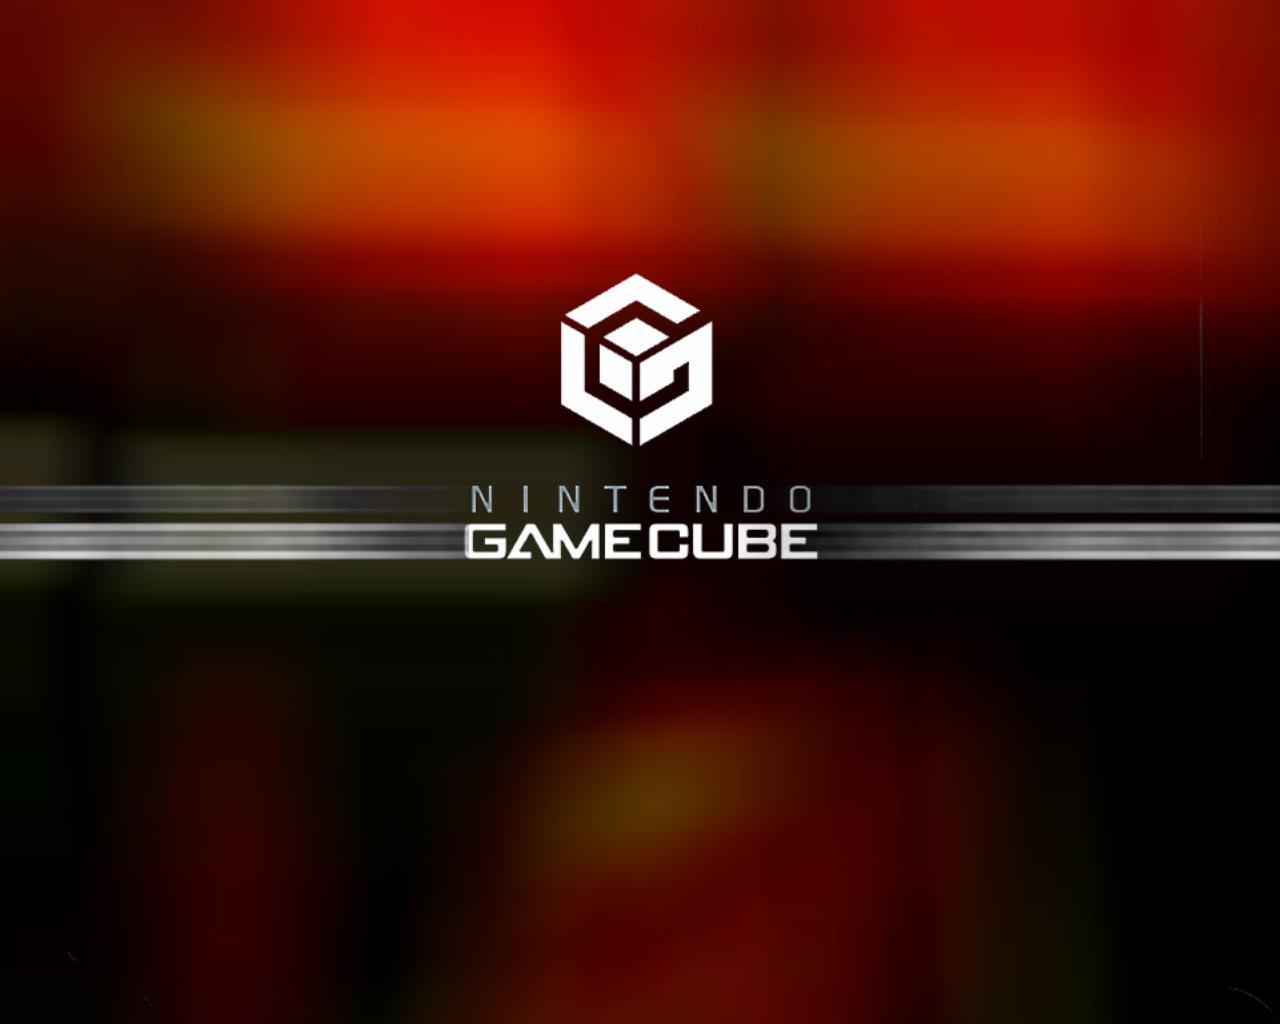 Gamecube wallpaper